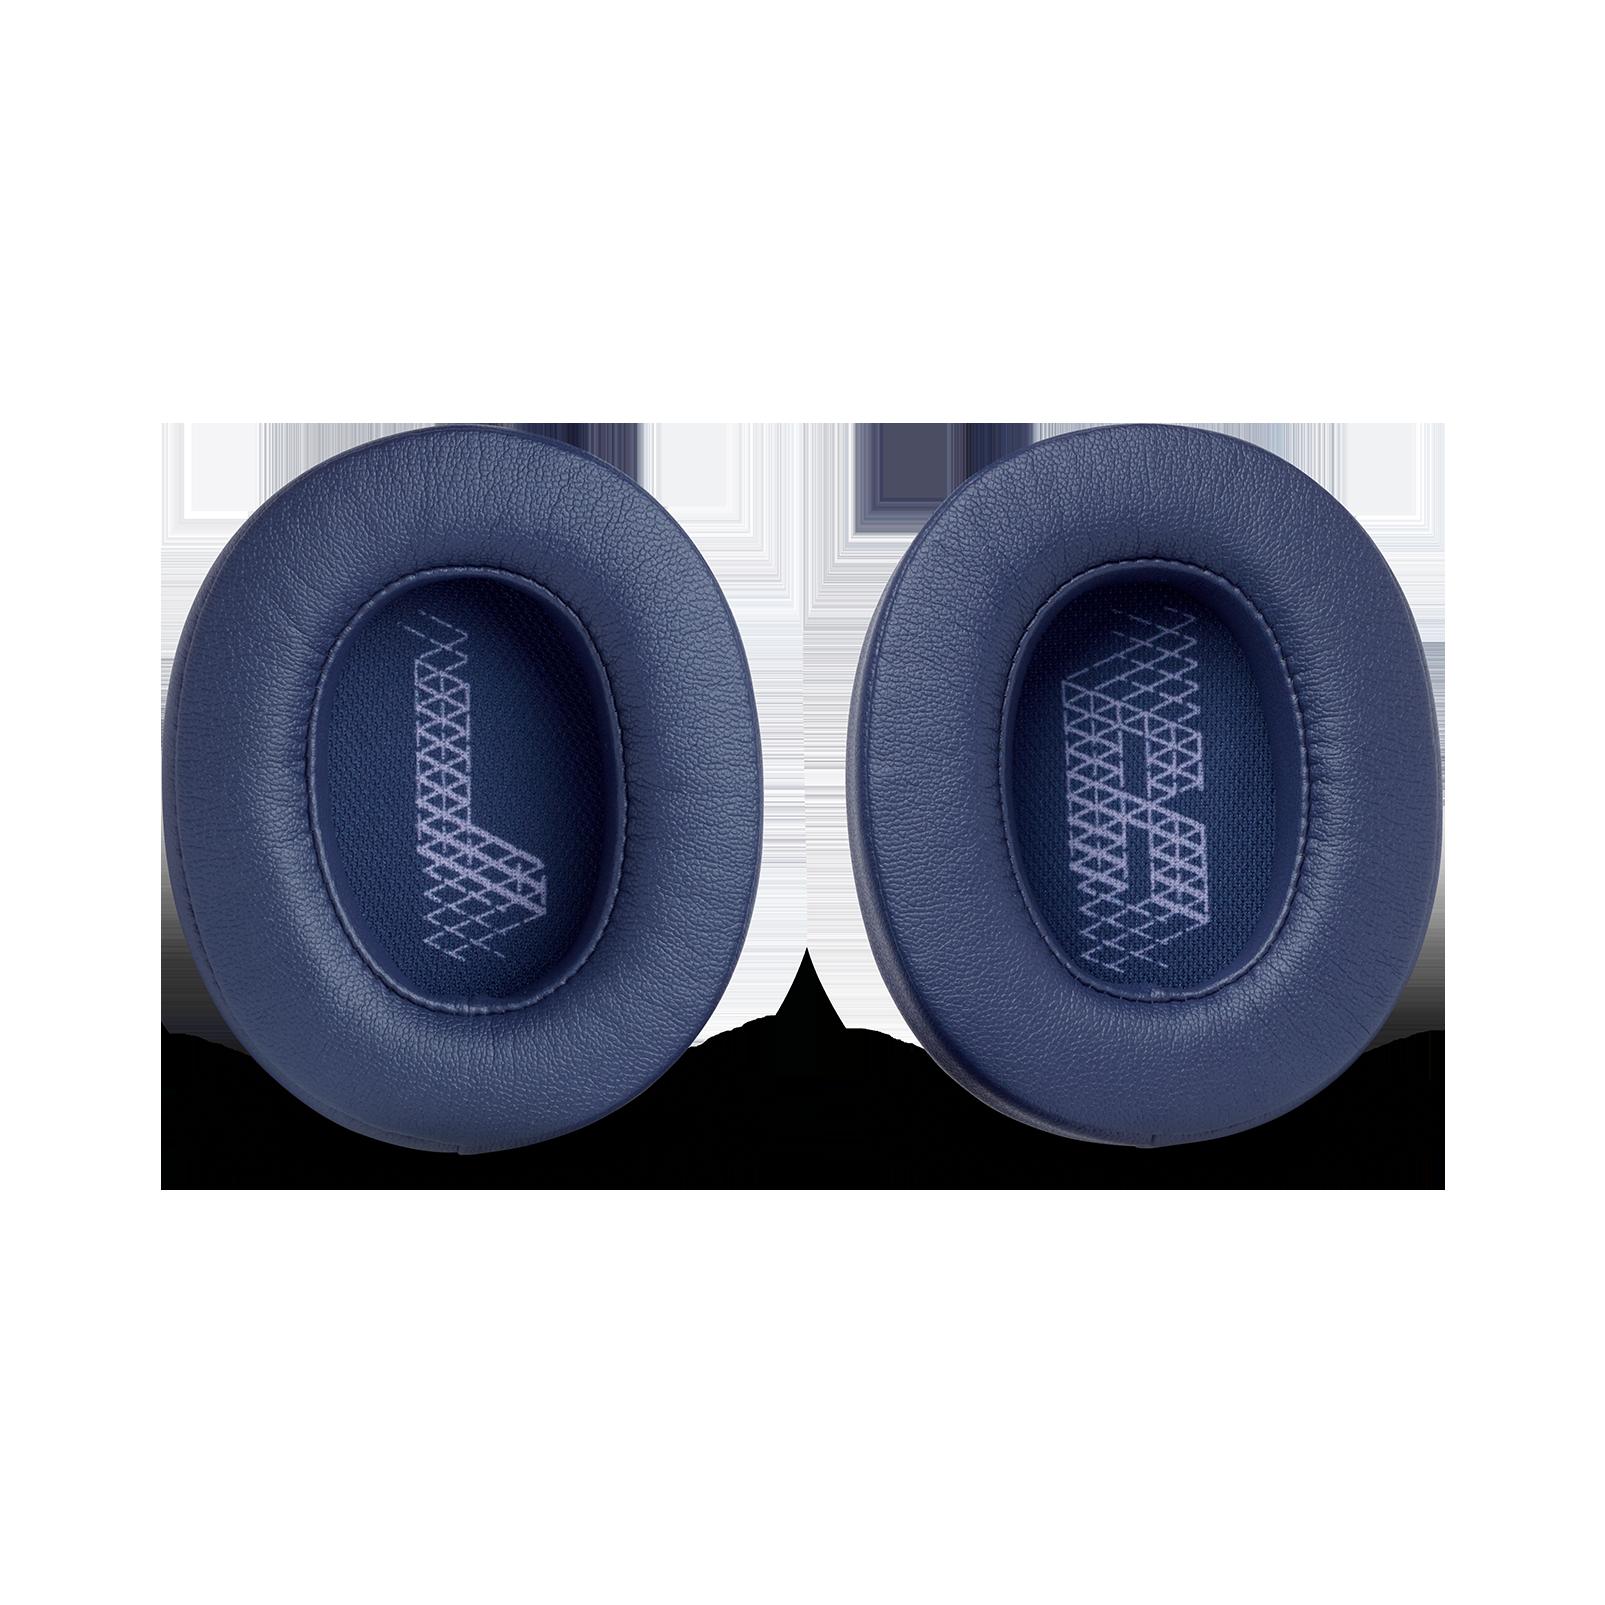 JBL Ear pads for Live 500 - Blue - Ear pads (L+R) - Hero